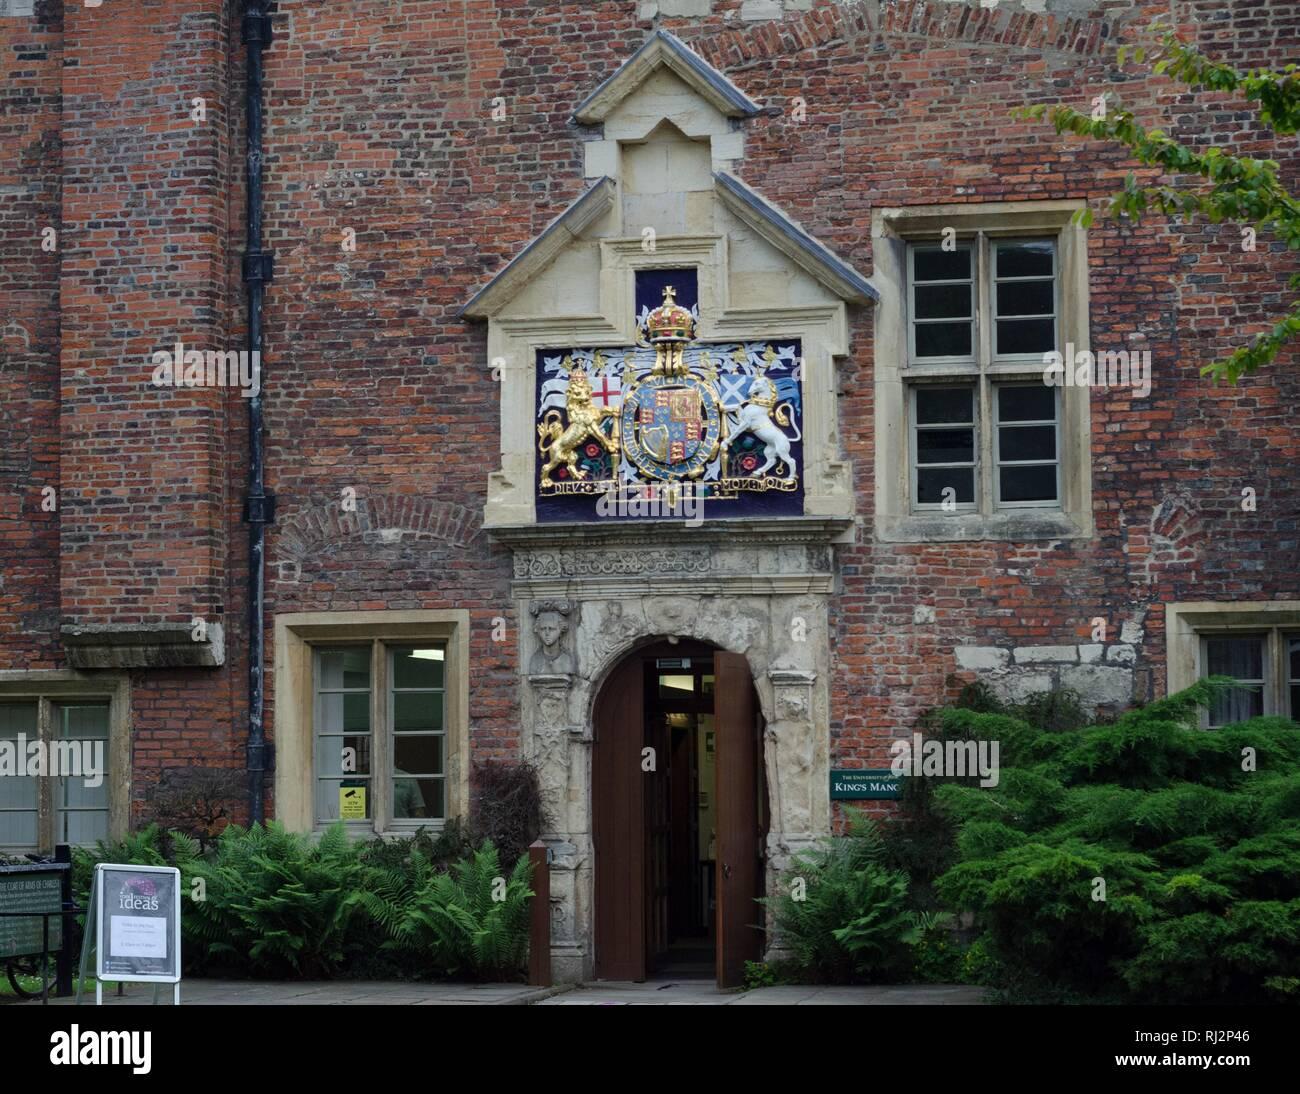 The main entrance to Kings Manor, University of York, York, England. - Stock Image